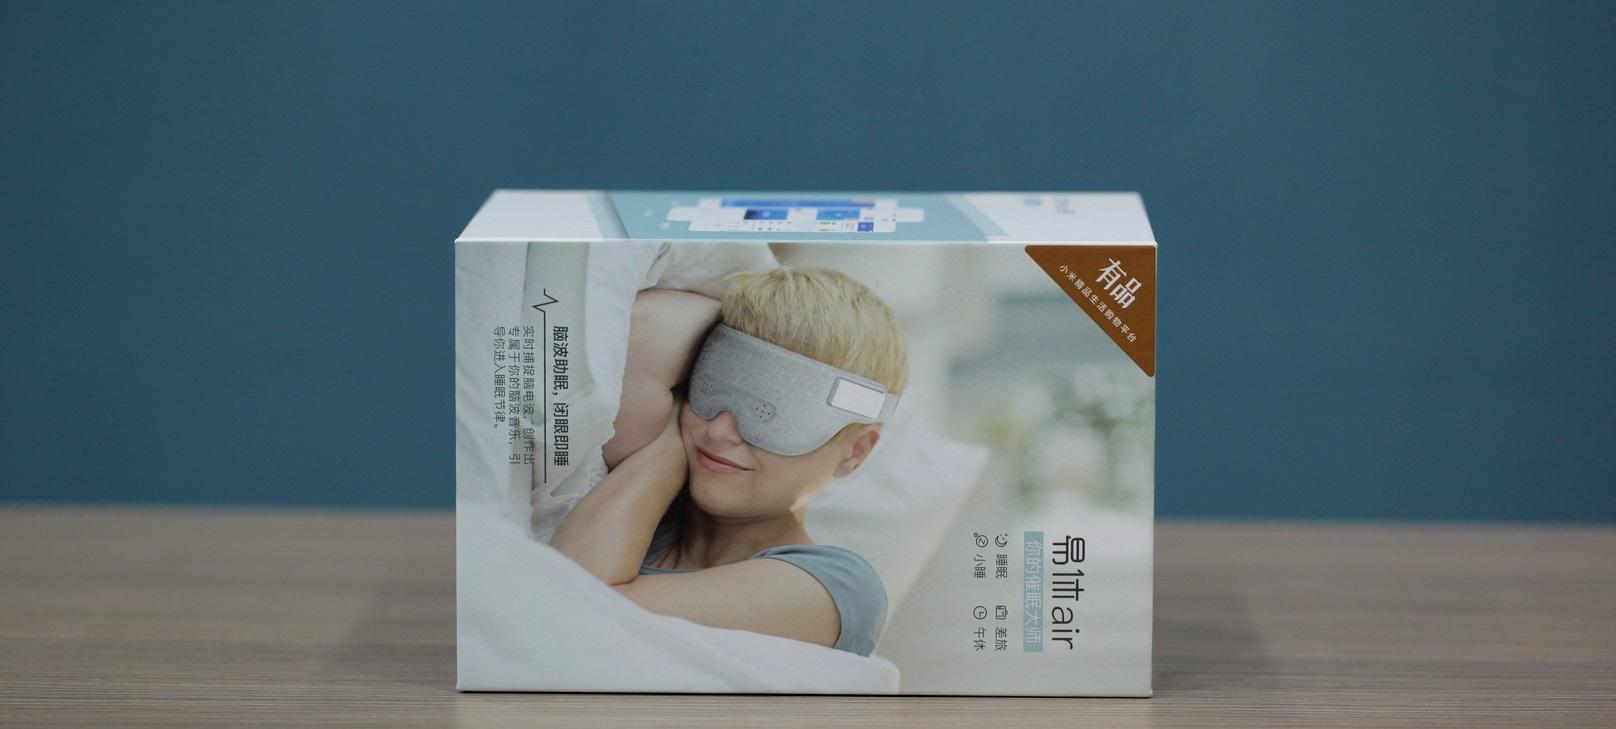 Antifaz Xiaomi caja